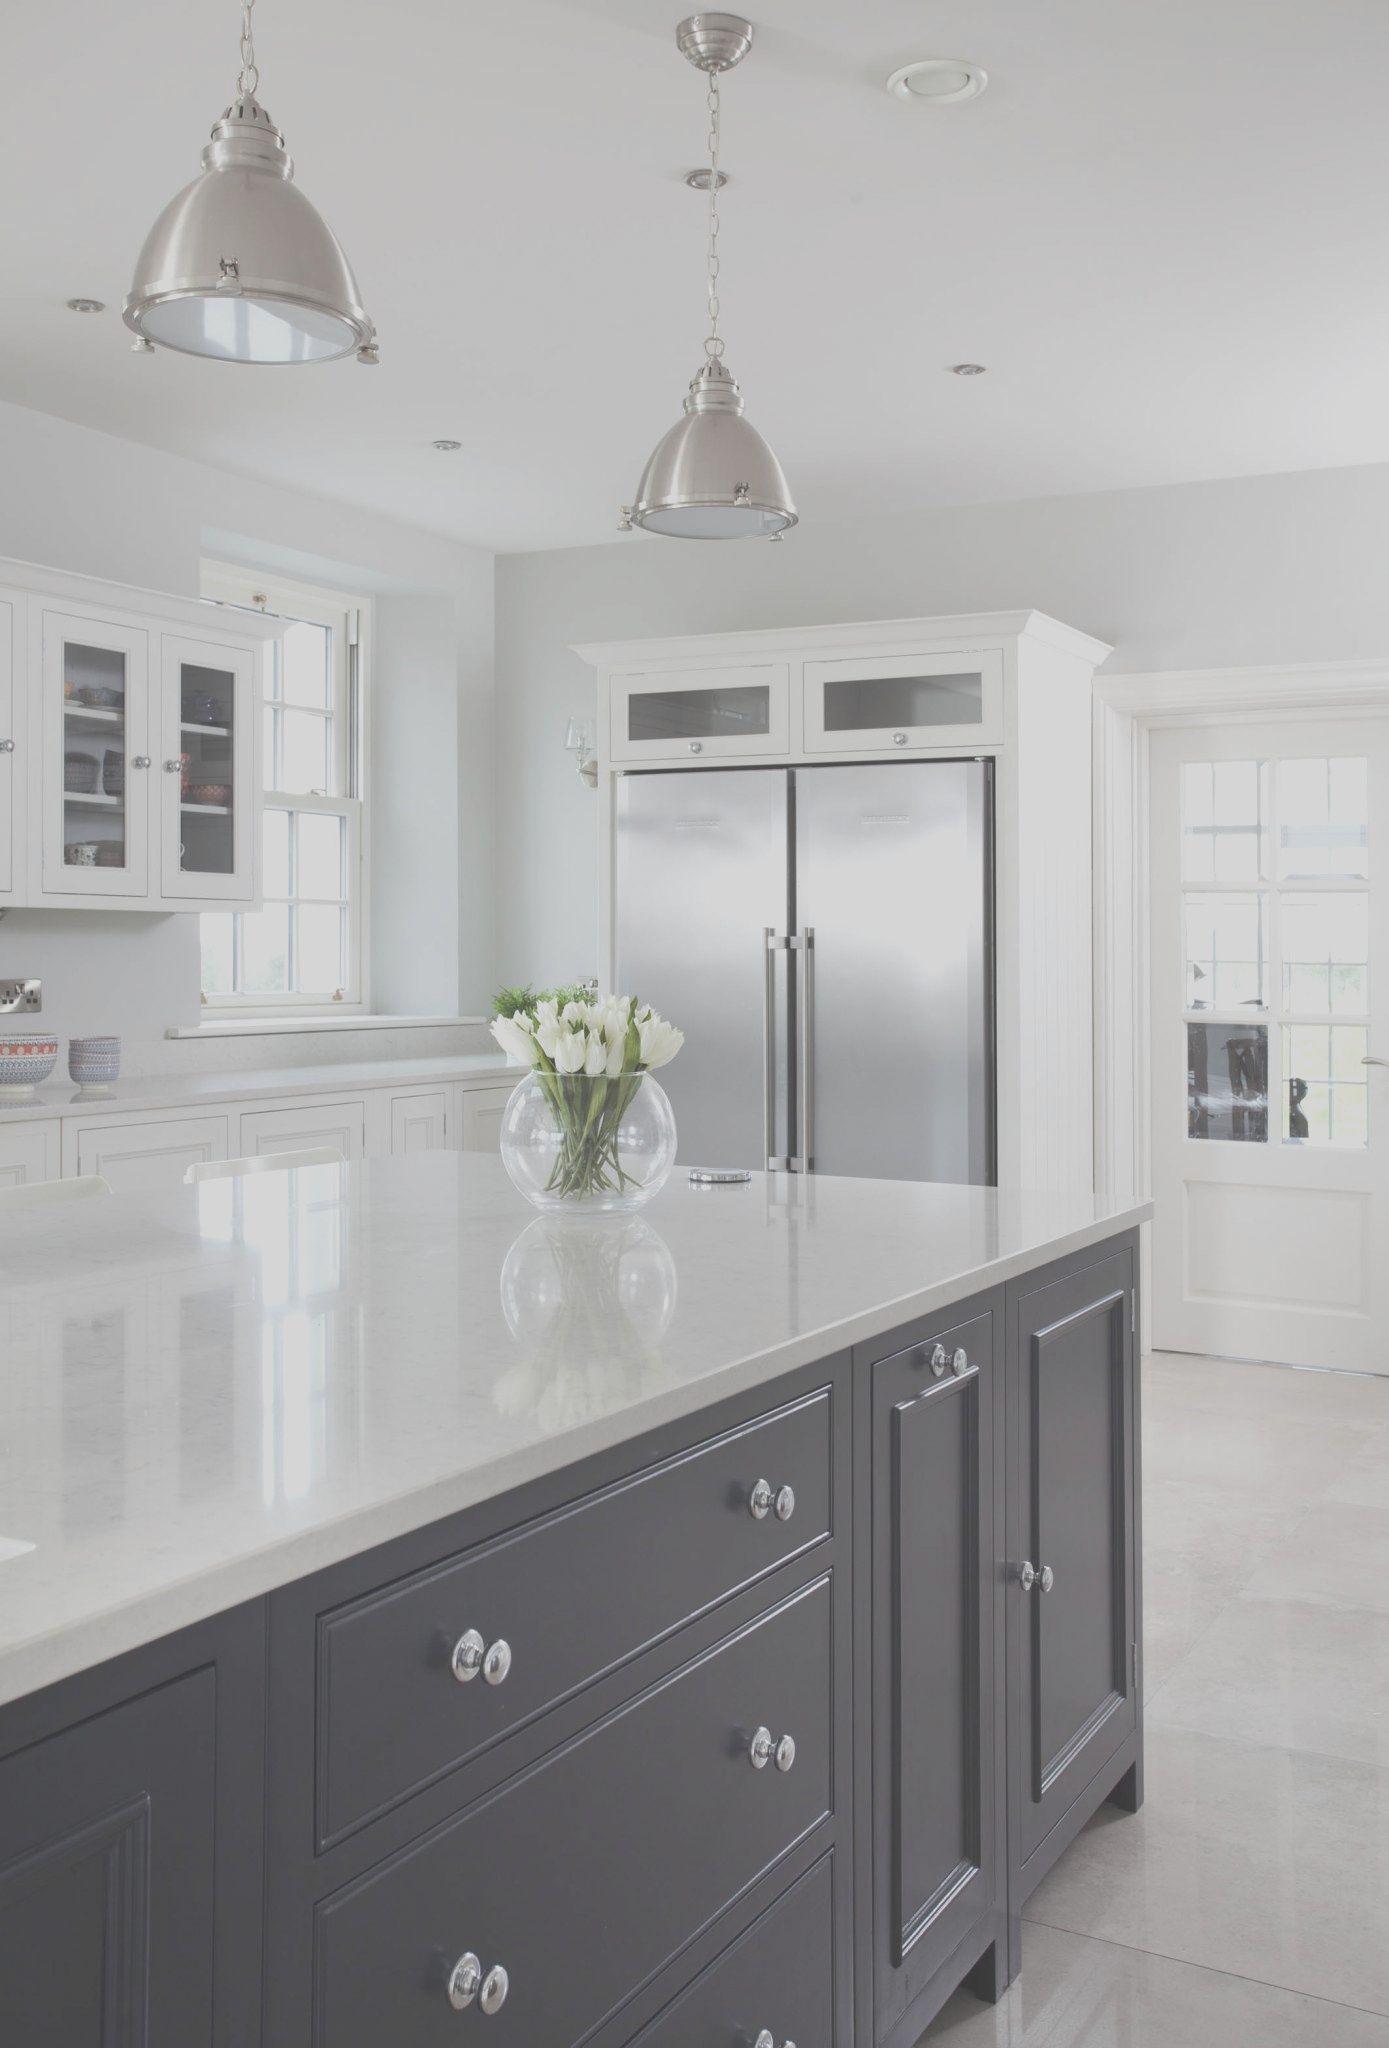 5 Expert Neptune Kitchen Furniture Photos in 5  Neptune